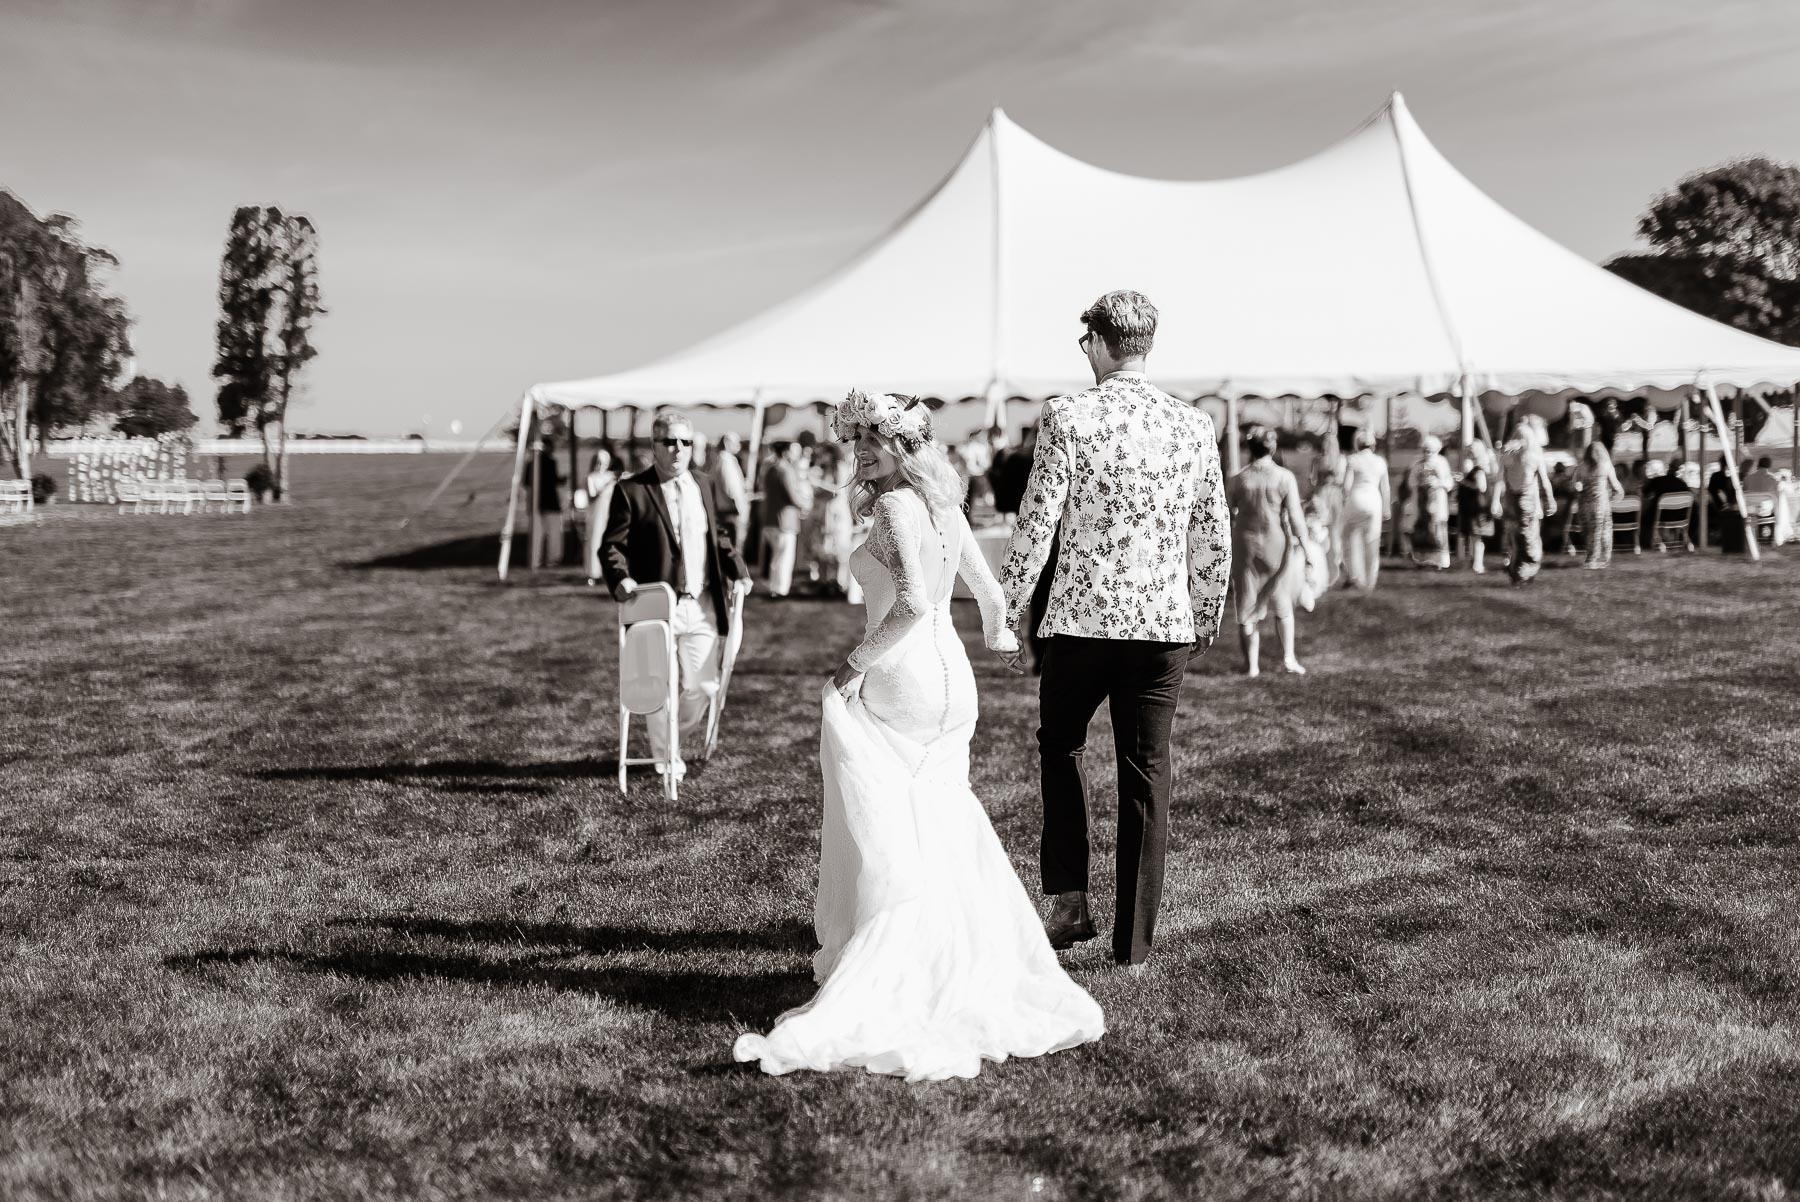 77-Bohemian New Hampshire Beach Wedding Rye New Hampshire Weddings Summer Sessions Surf Shop Longbrook Photography.jpg